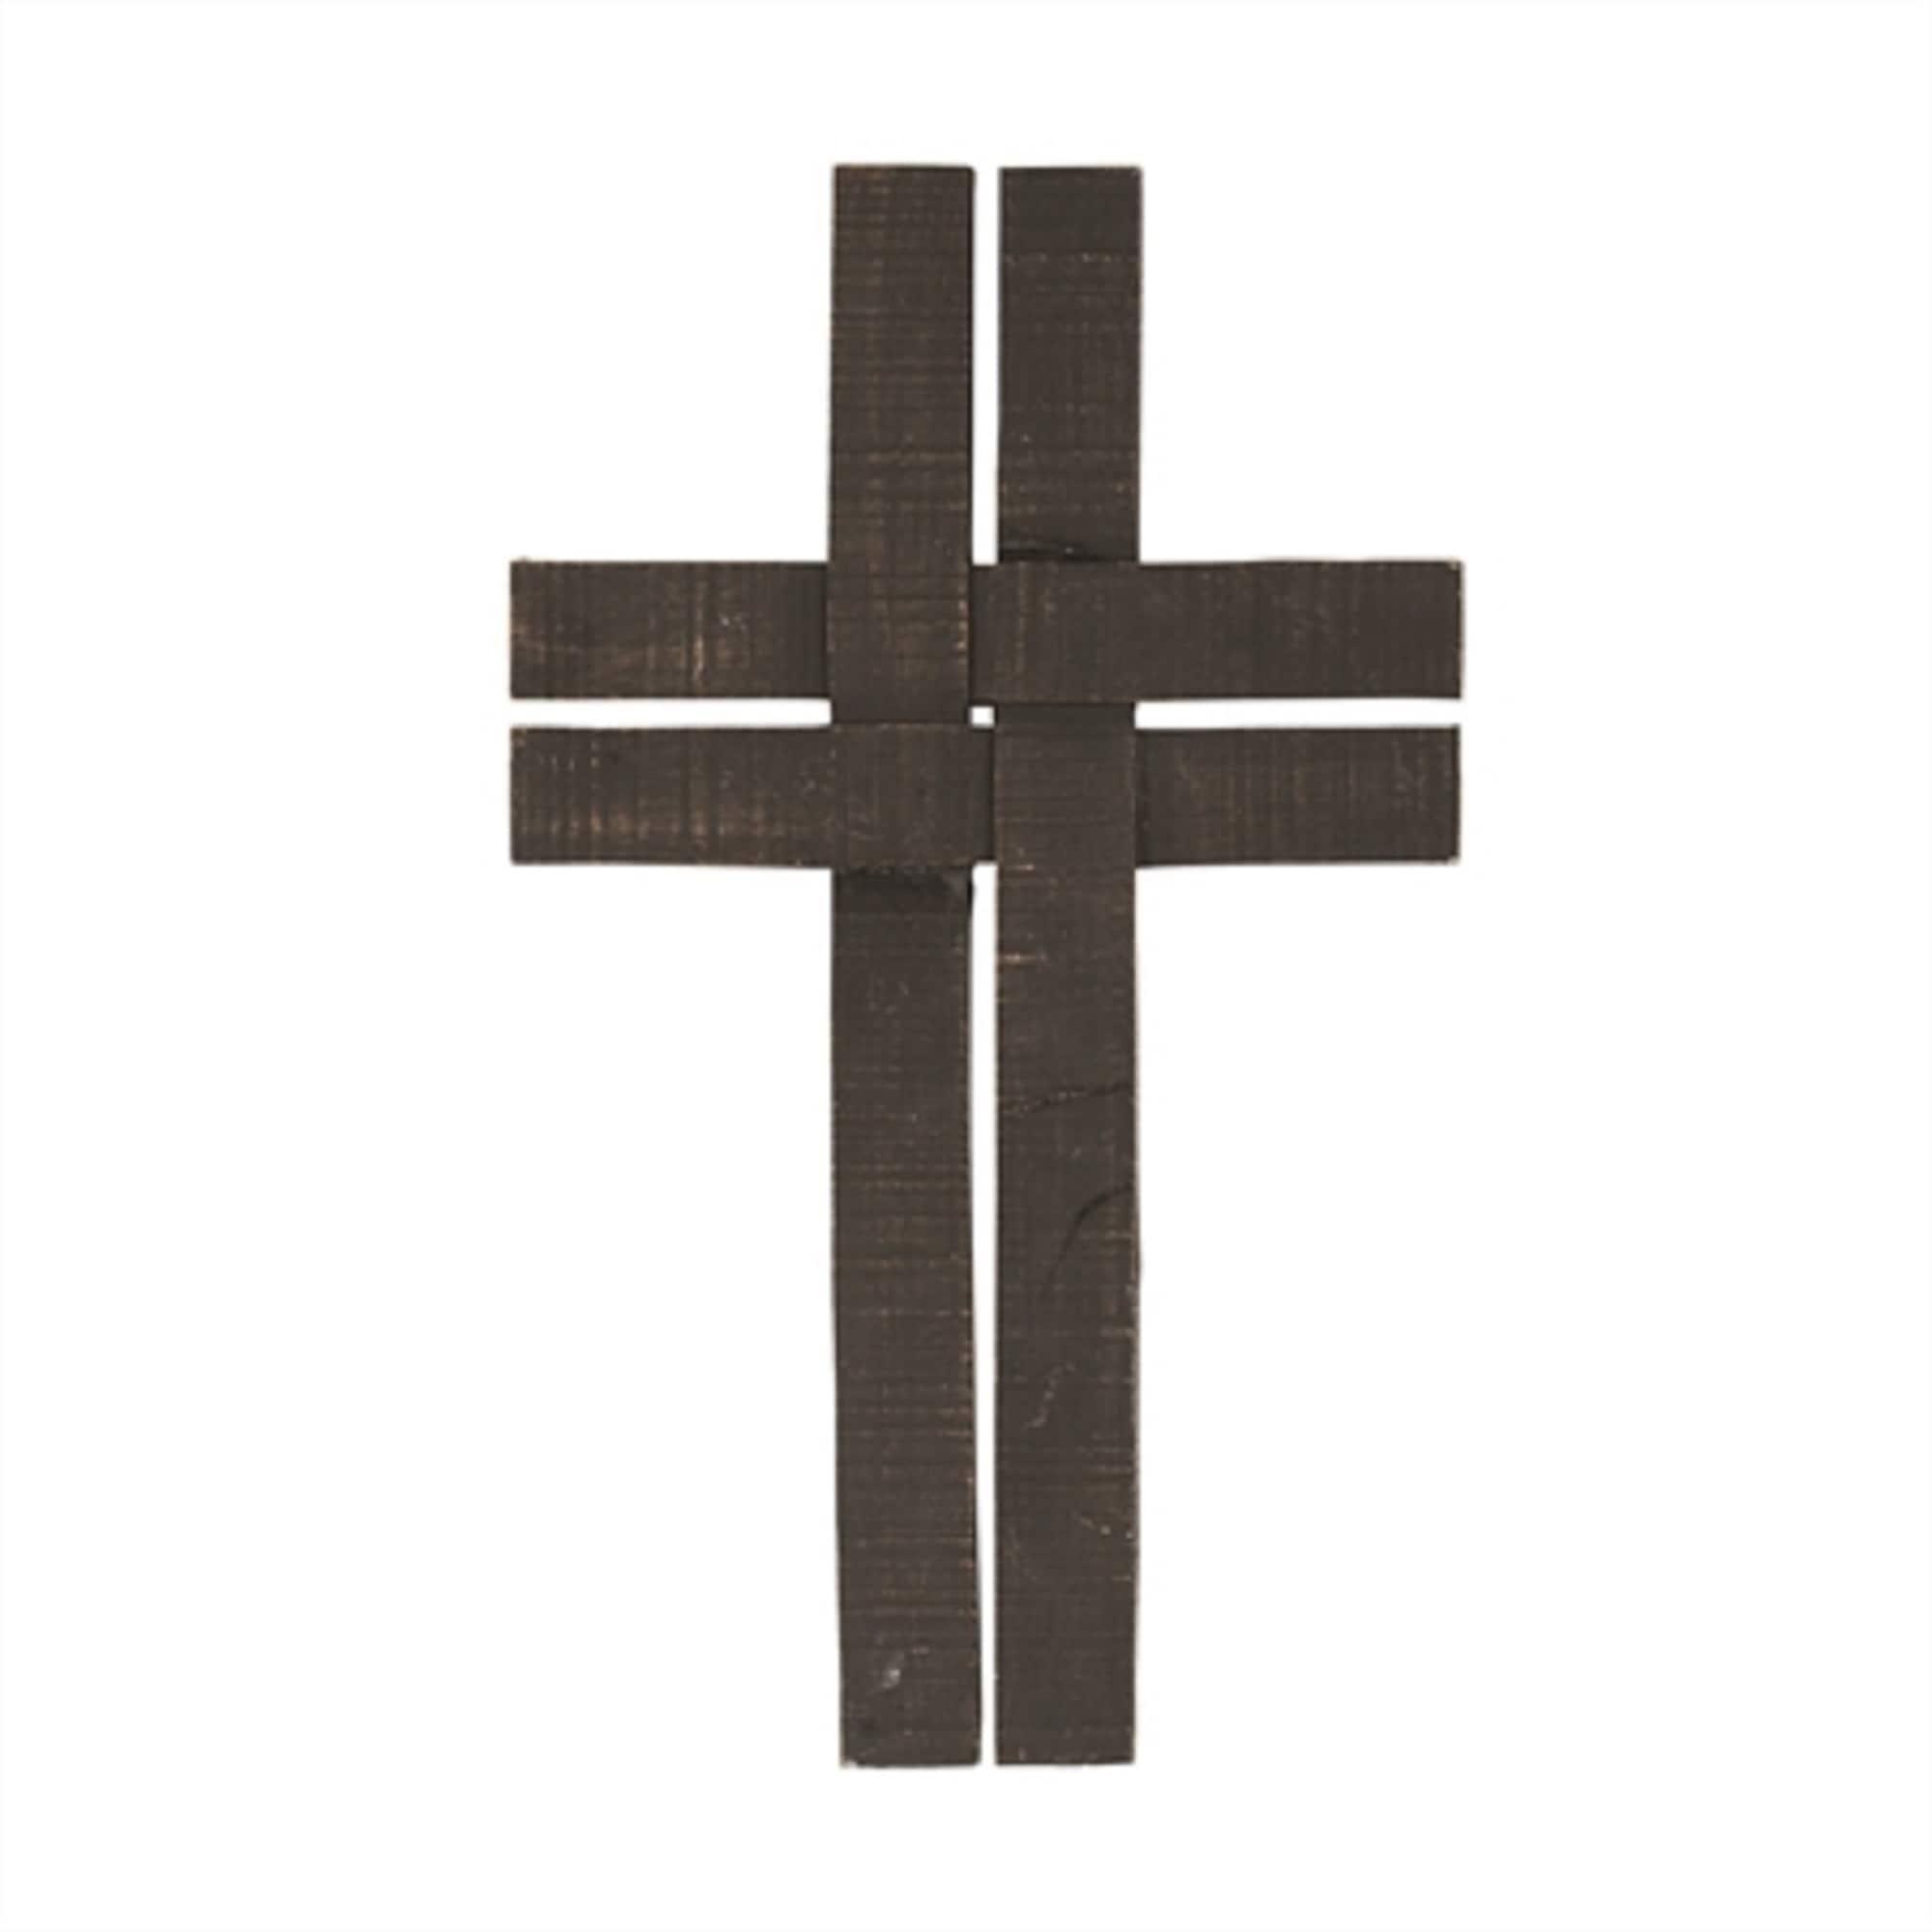 Cross Shaped Religious Wall Decor